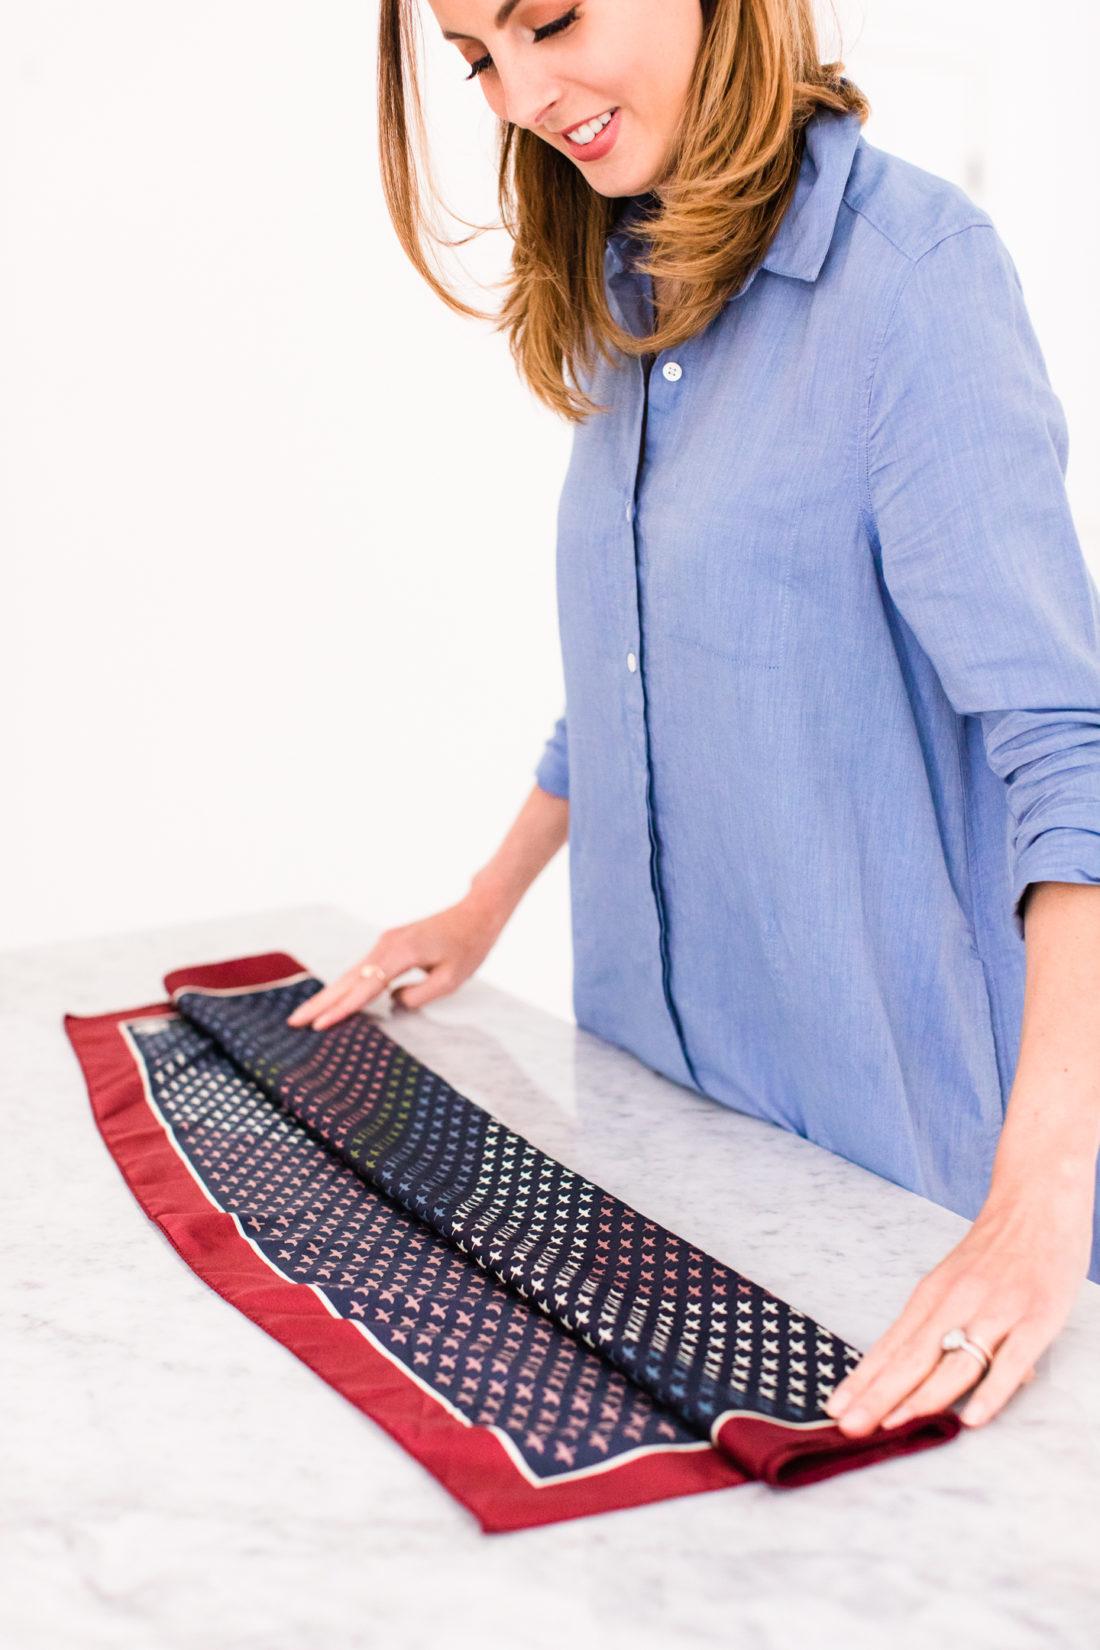 Eva Amurri Martino folds a printed silk scarf to tie around the strap of her purse